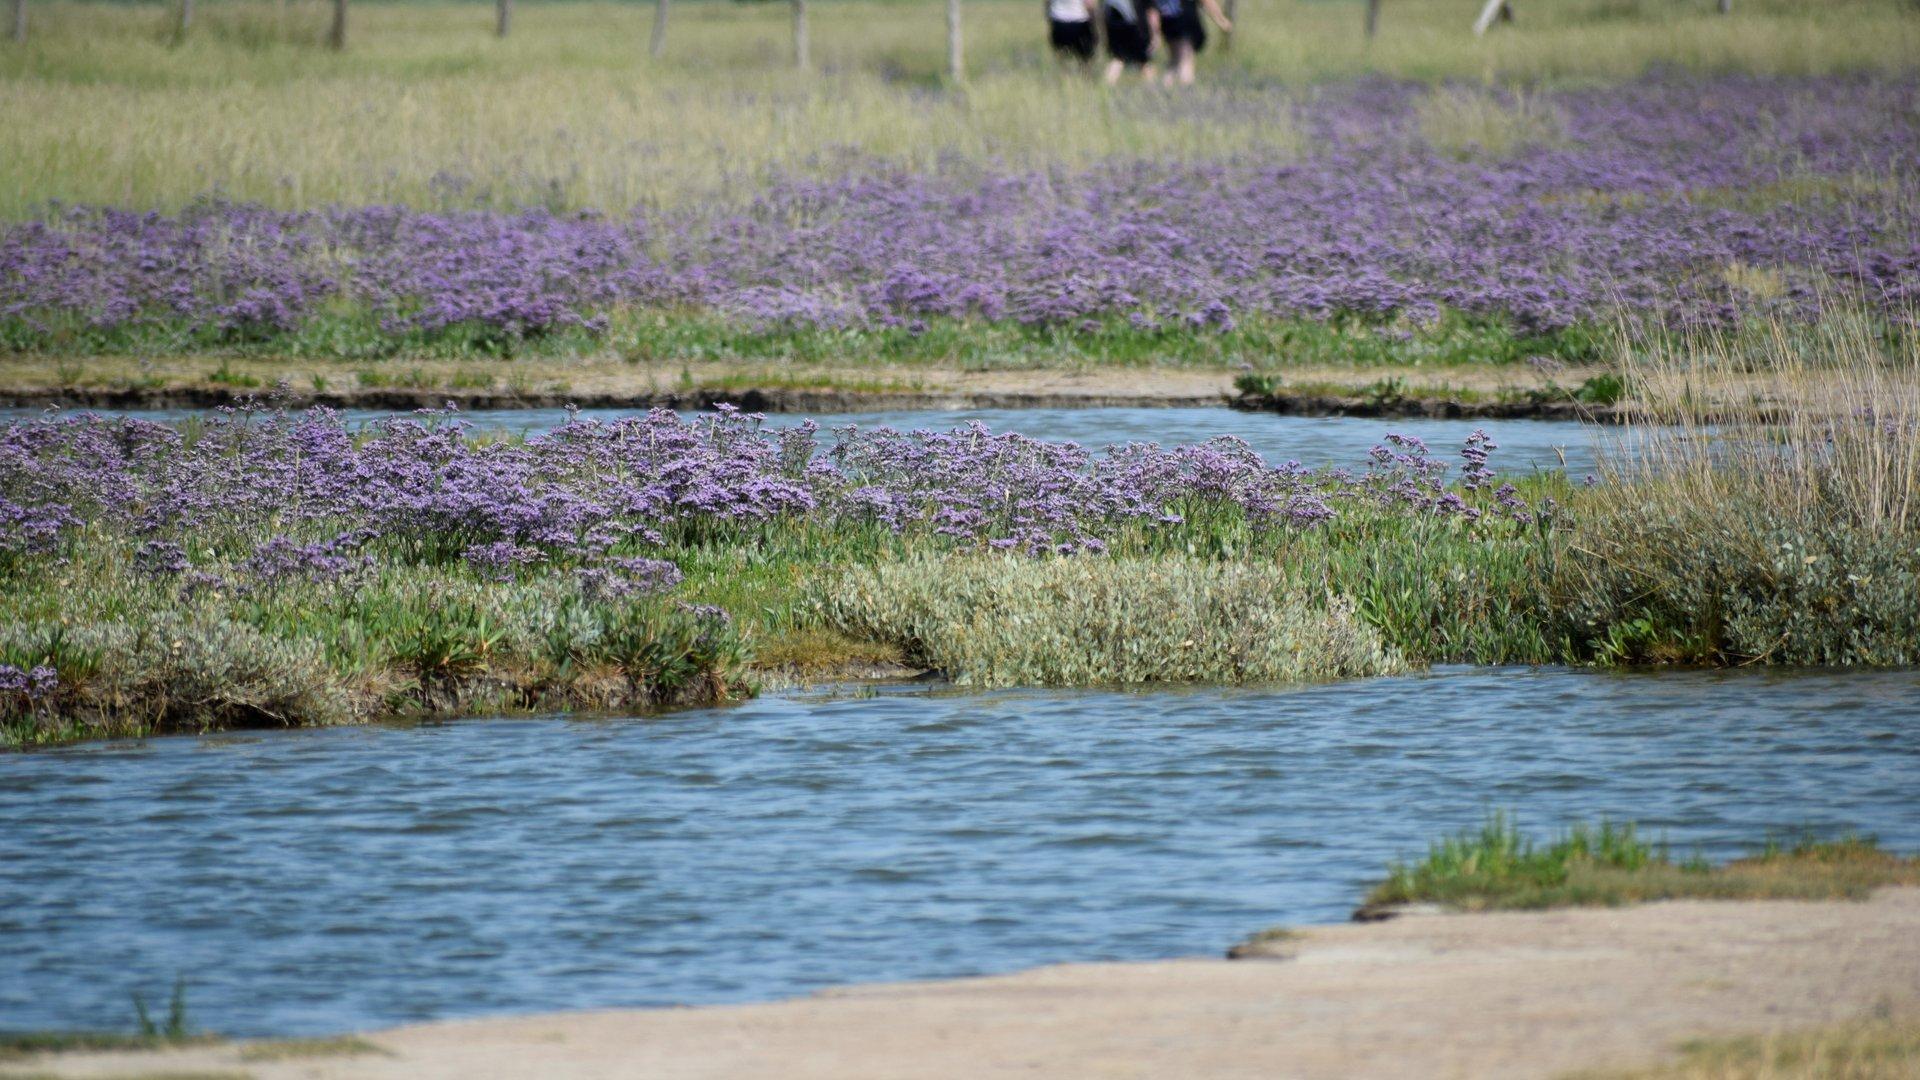 Best time to see Sea Lavender (Lamsoor) in the Zwin in Belgium 2020